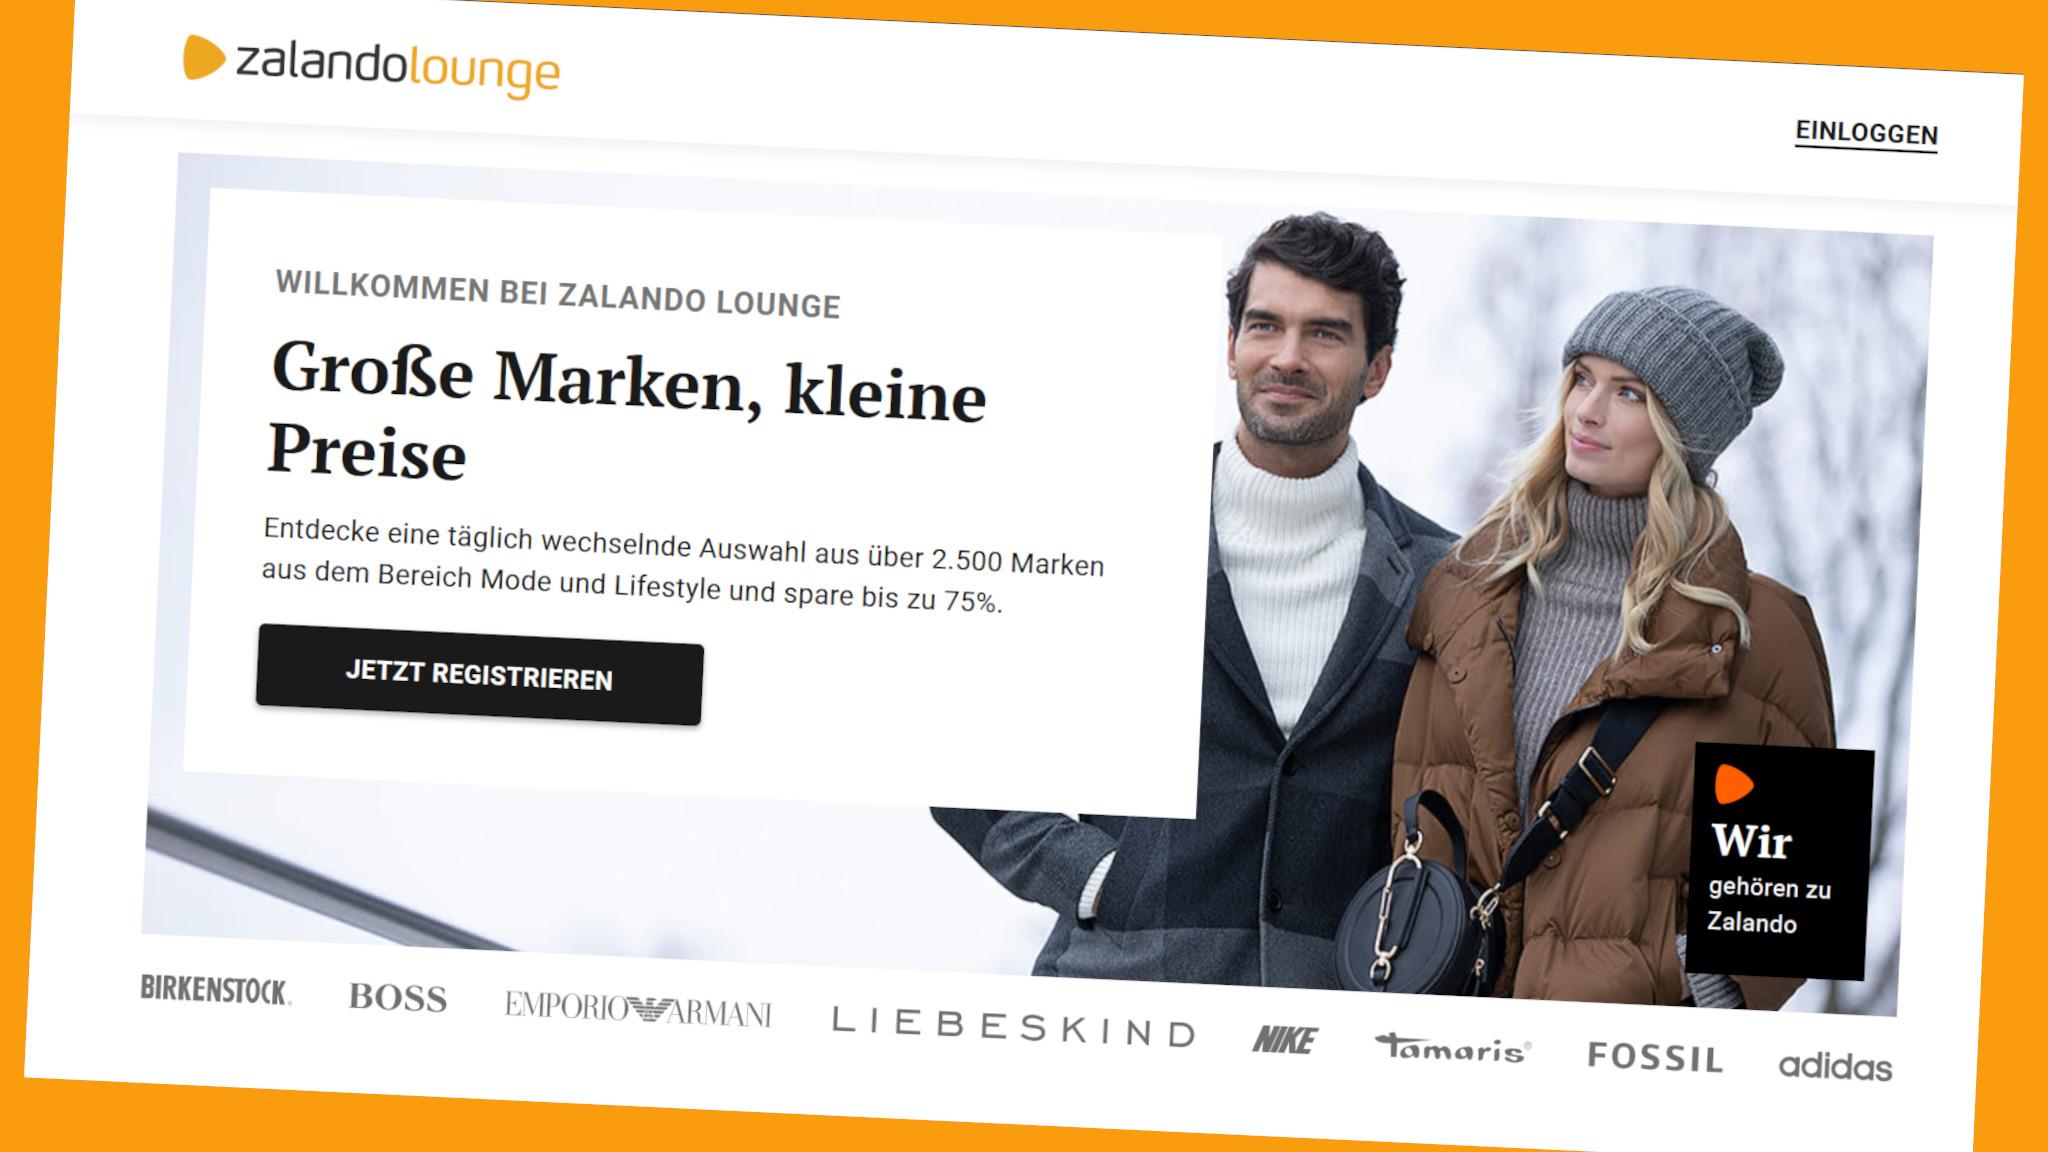 Zalando Lounge: Mitglieder sparen täglich©Screenshot www.zalando-lounge.de